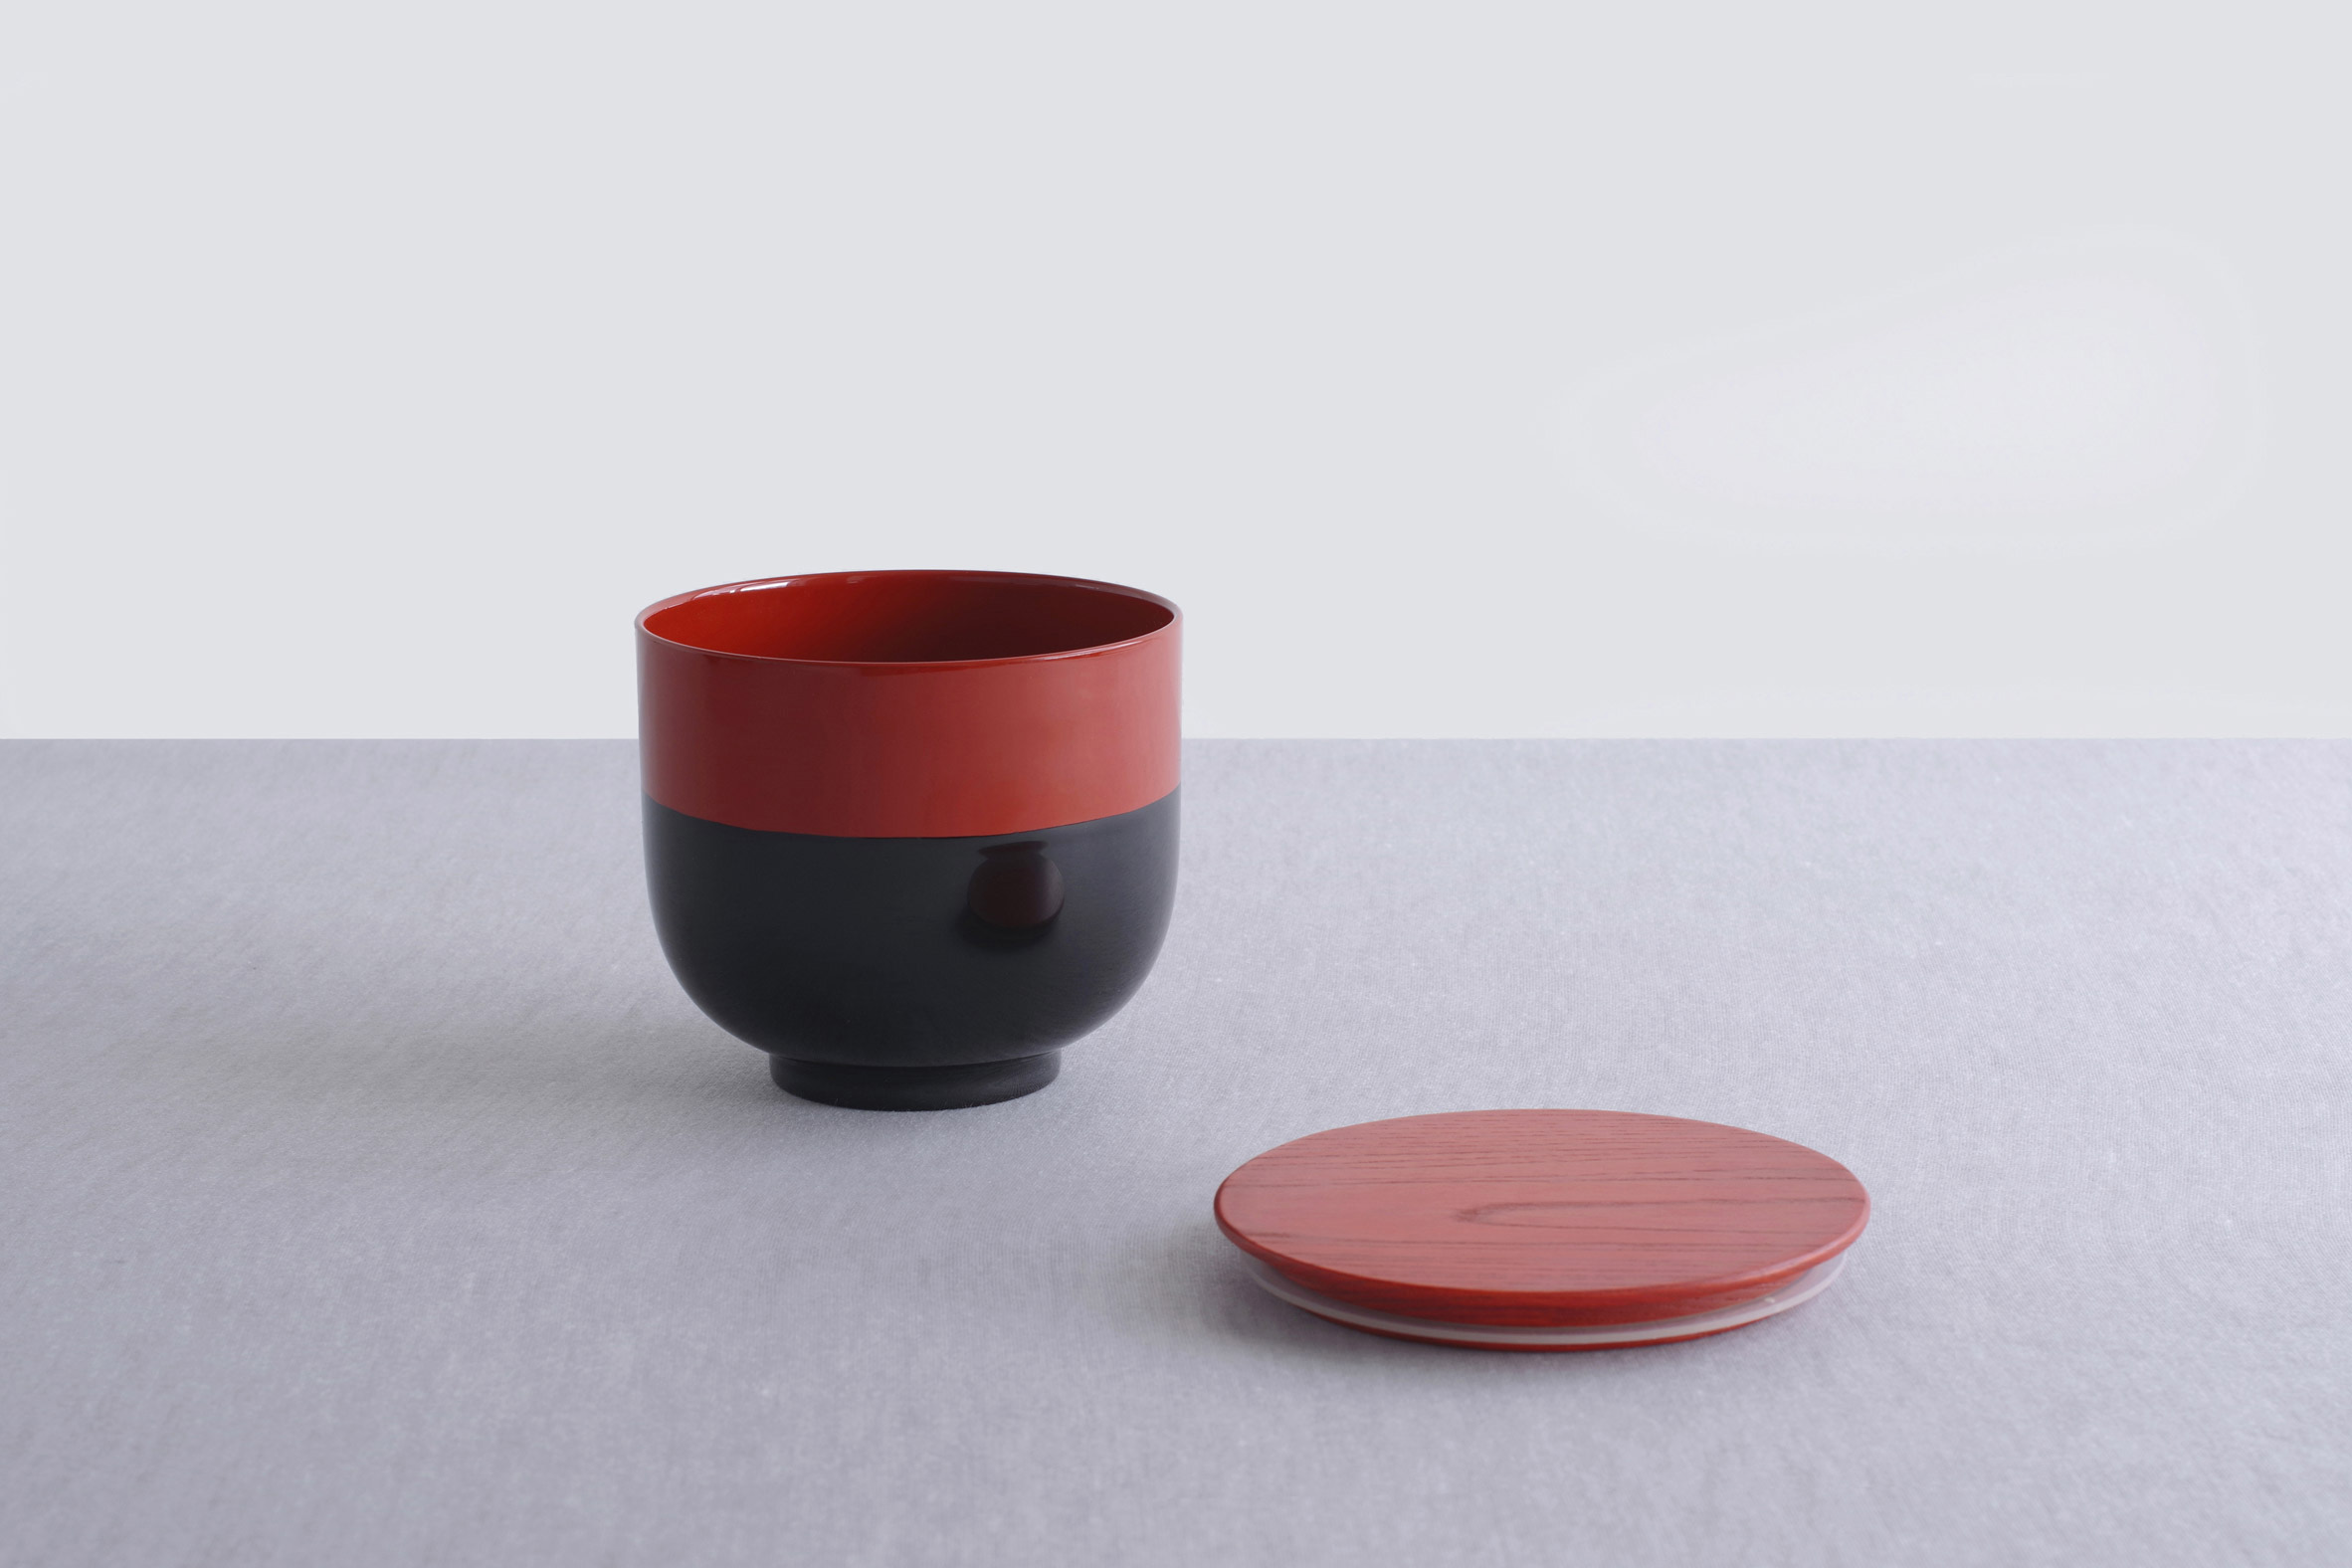 store-sekisaka-japan-creative-design-milan-homeware-_dezeen_2364_col_2.jpg